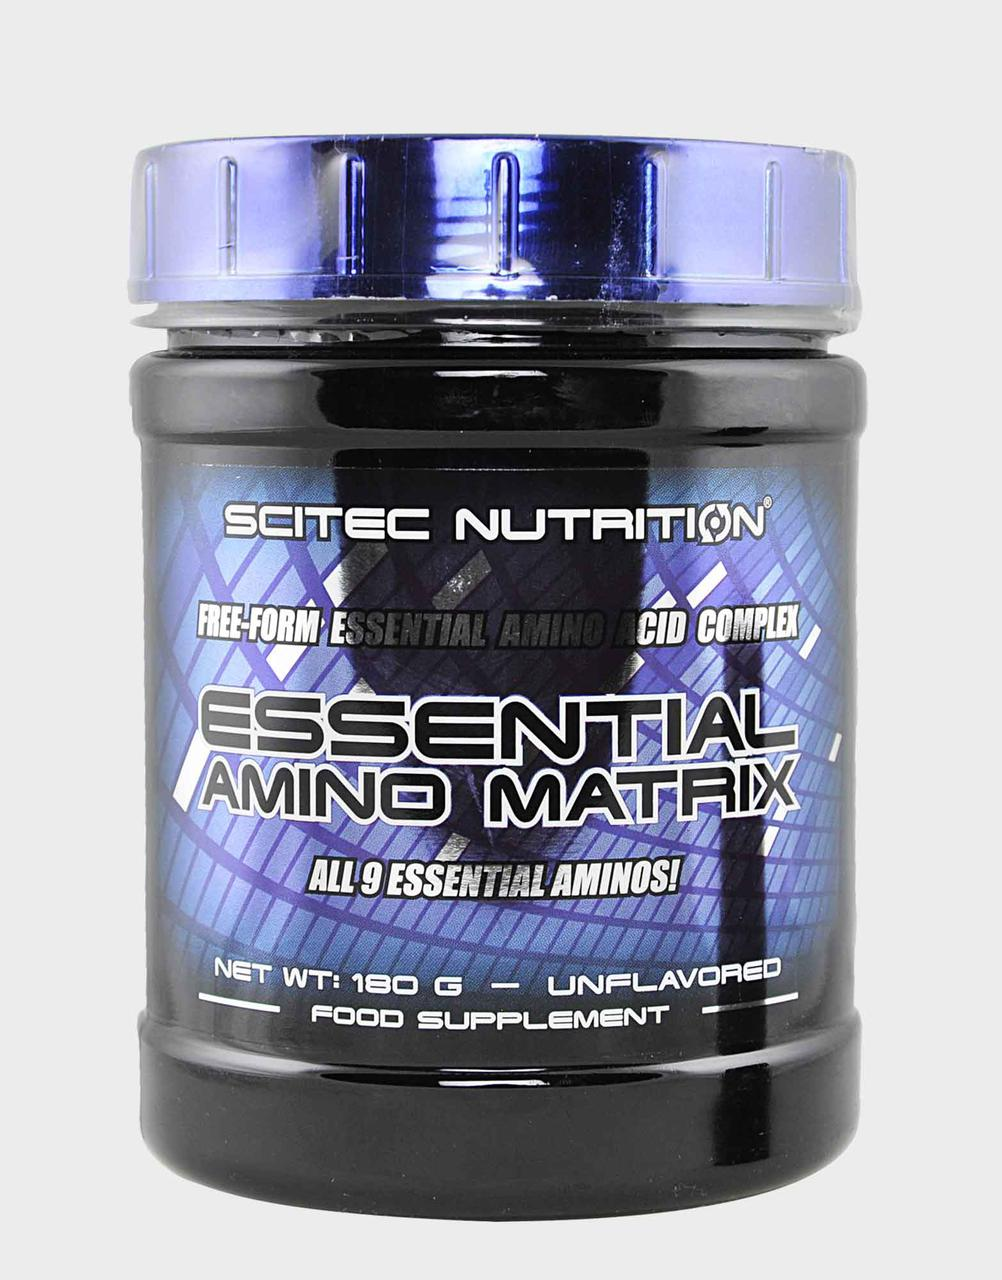 Аминокислоты Scitec Nutrition Essential Amino Matrix 180 g